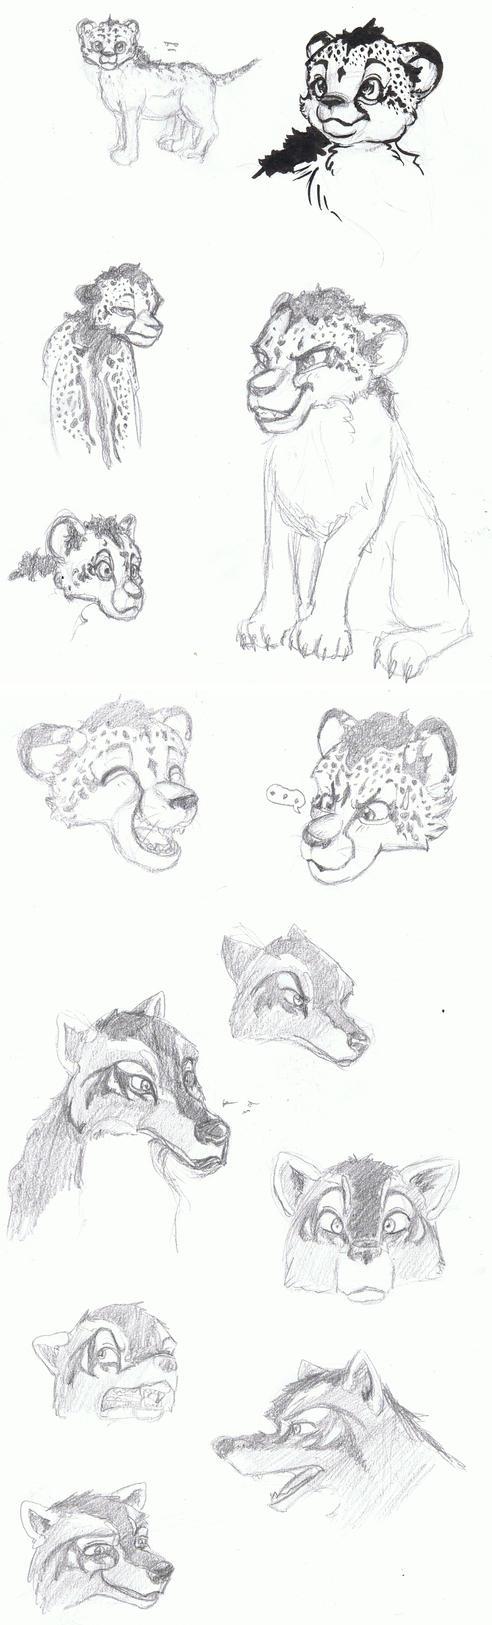 Sketchdump 04.07.2017 by Sevel